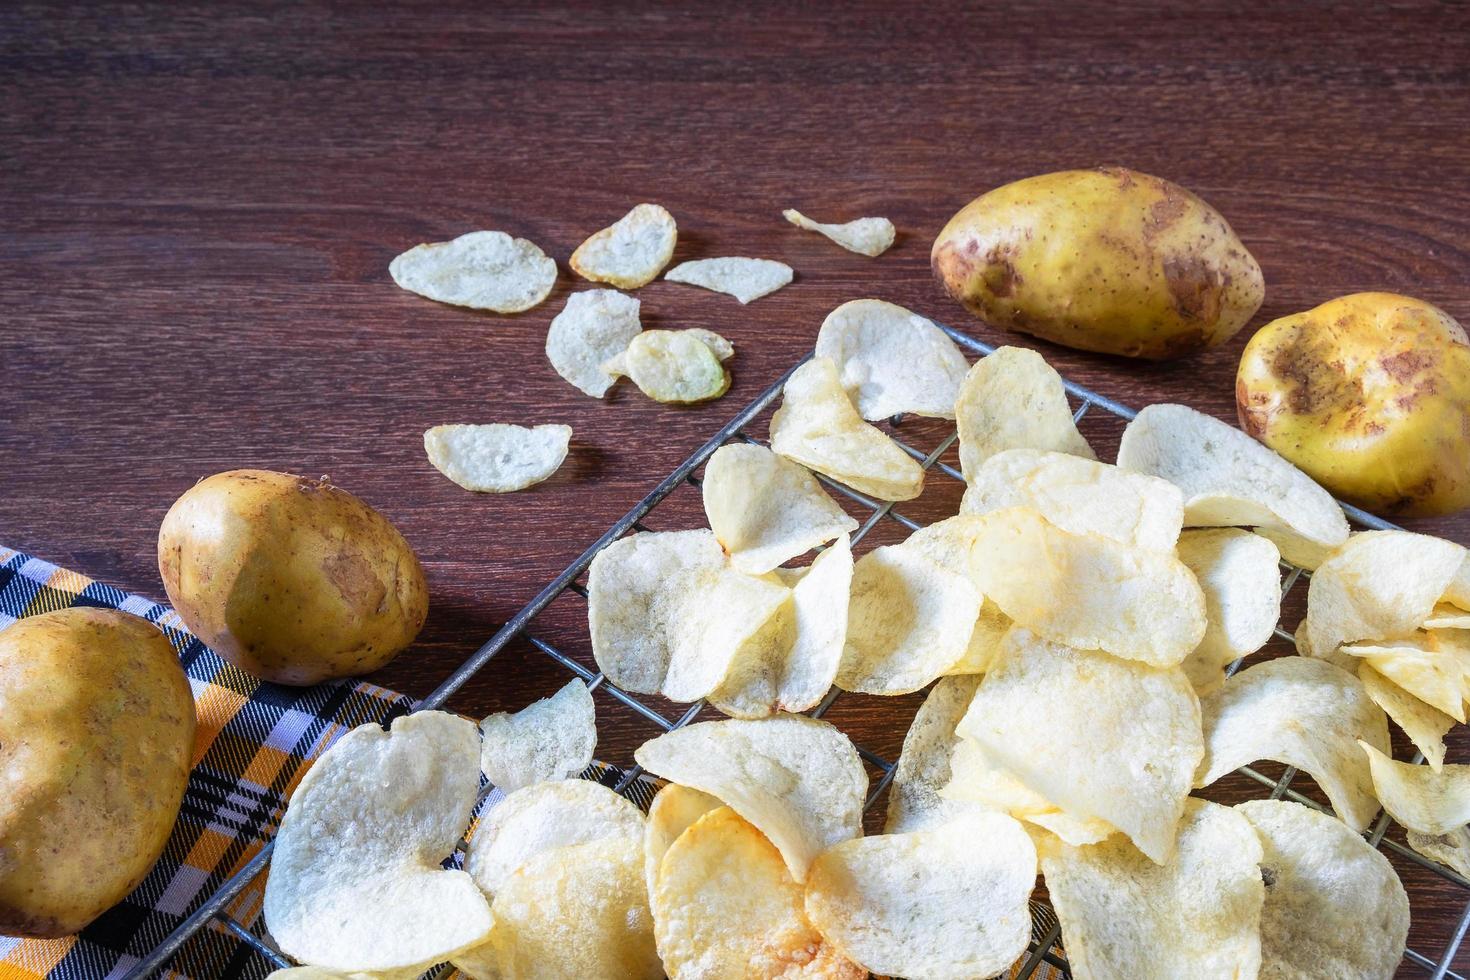 alcune patatine fritte fresche foto